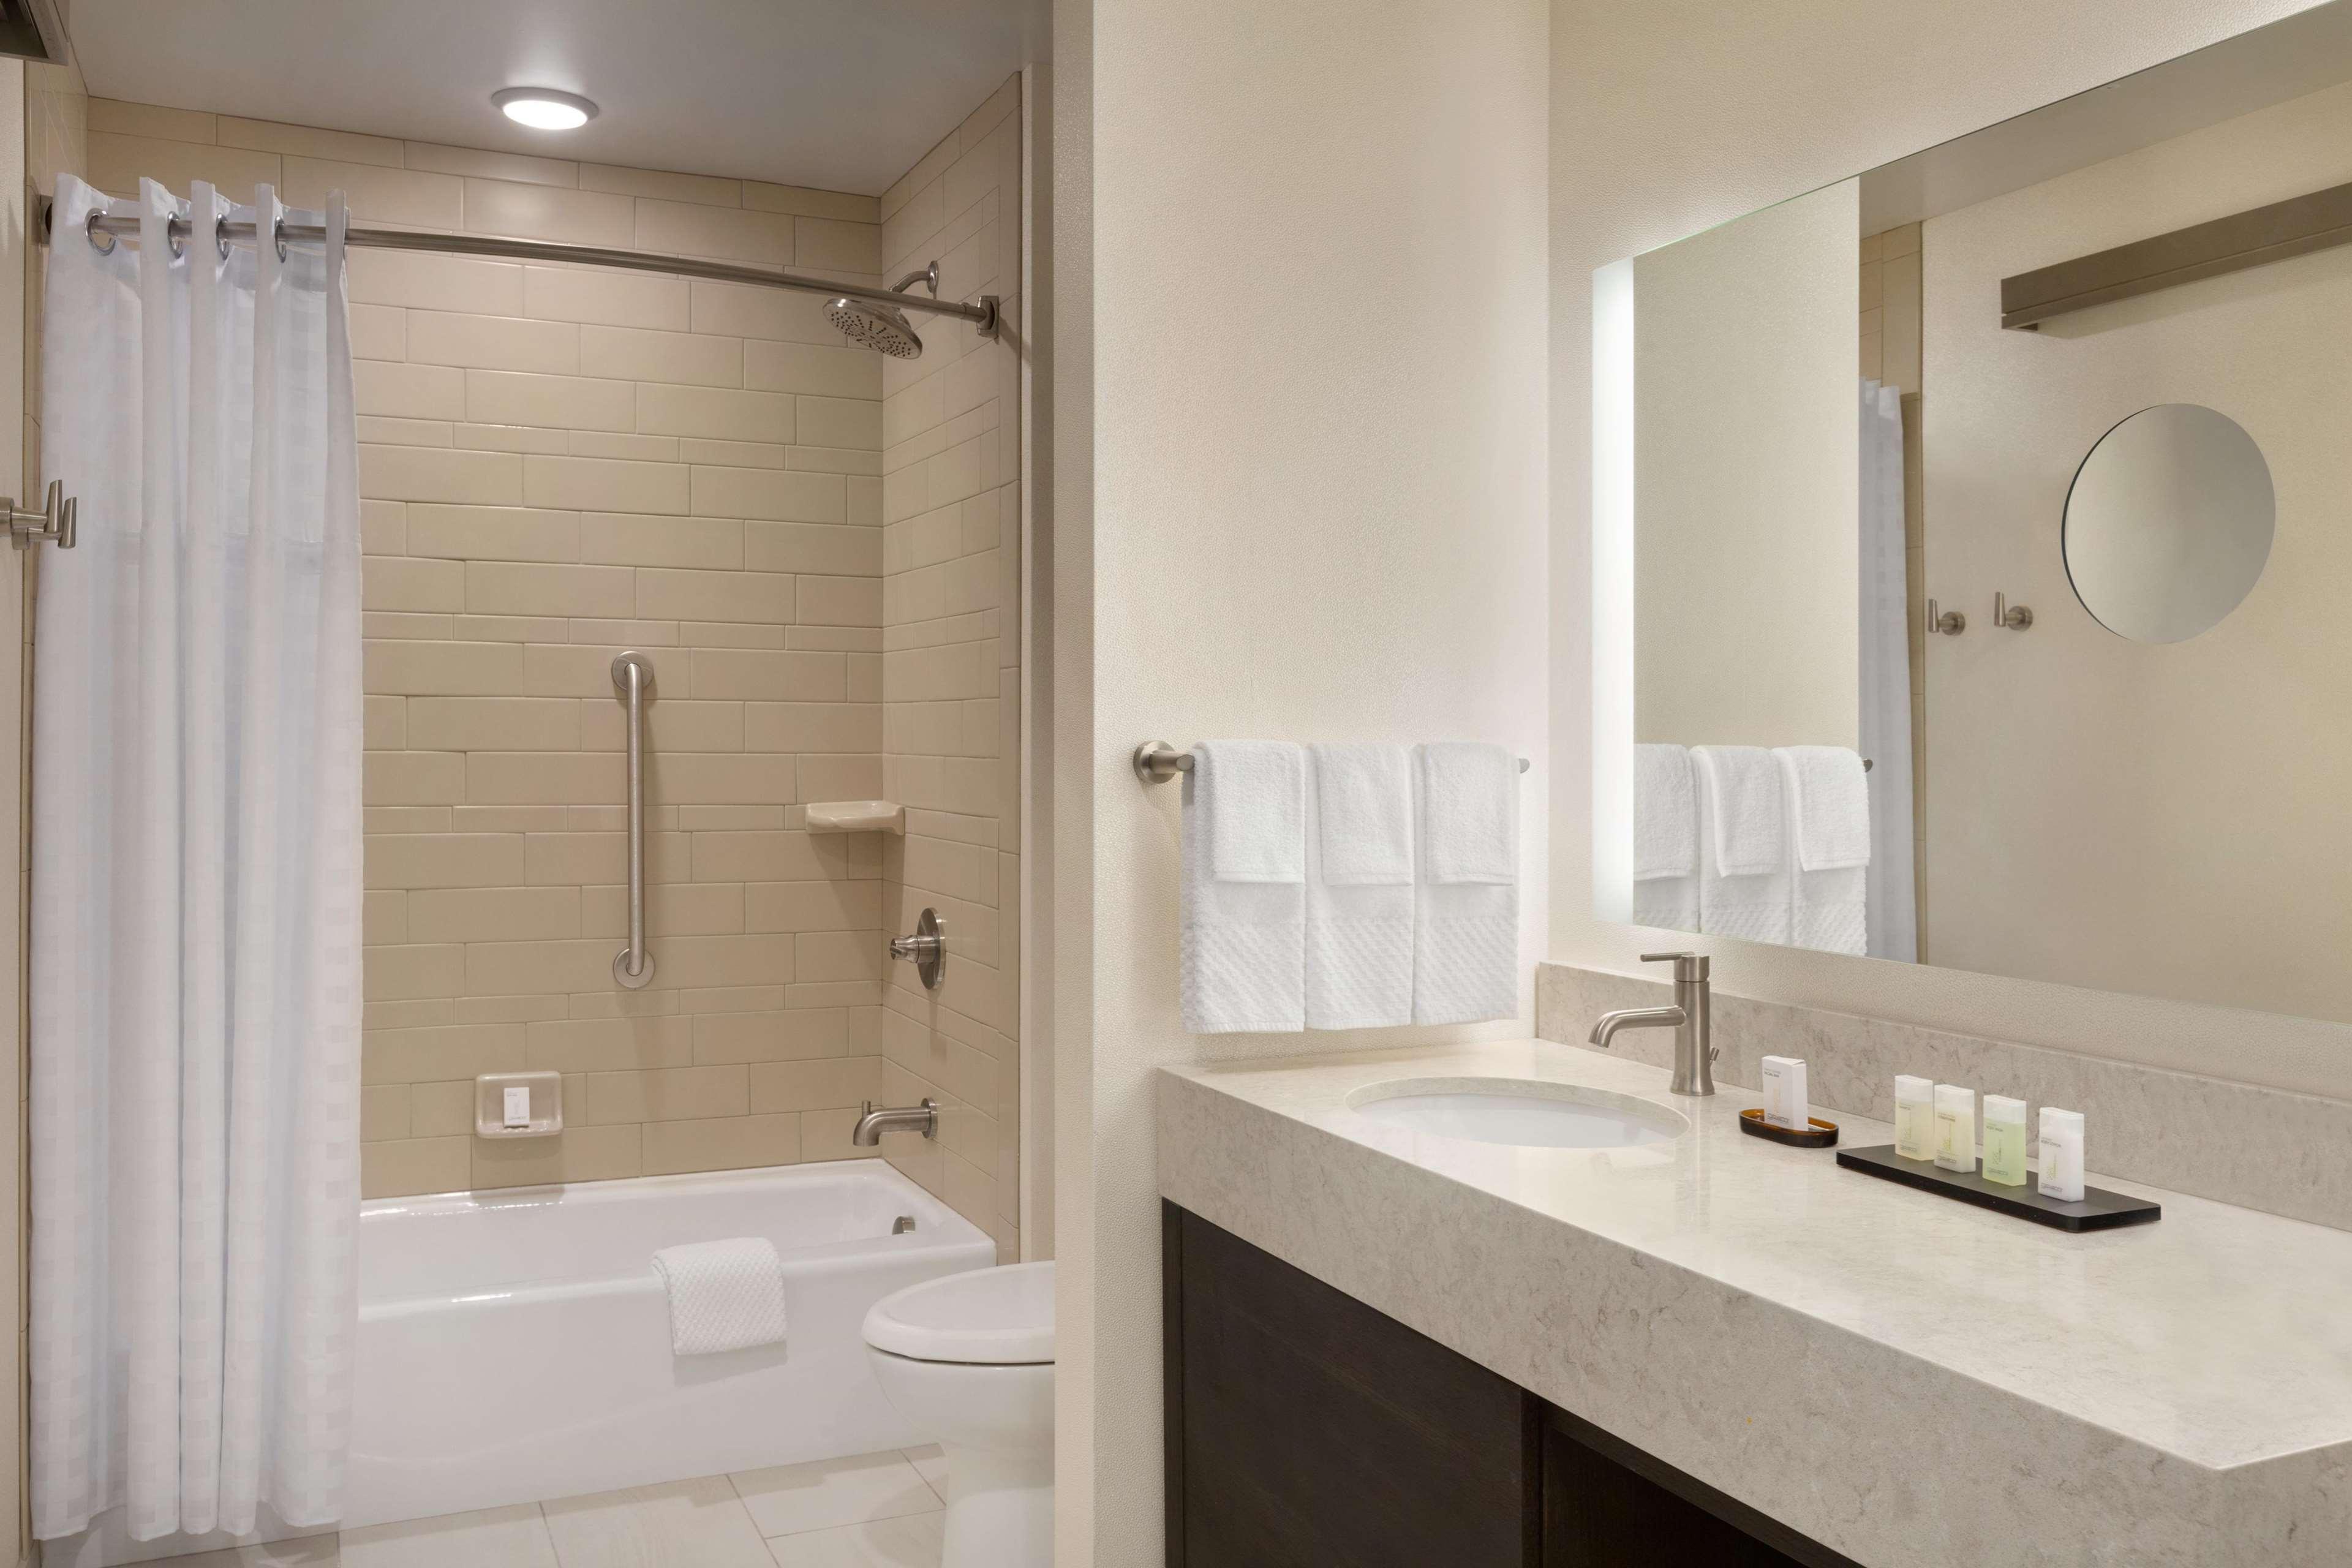 Embassy Suites by Hilton Syracuse Destiny USA image 16